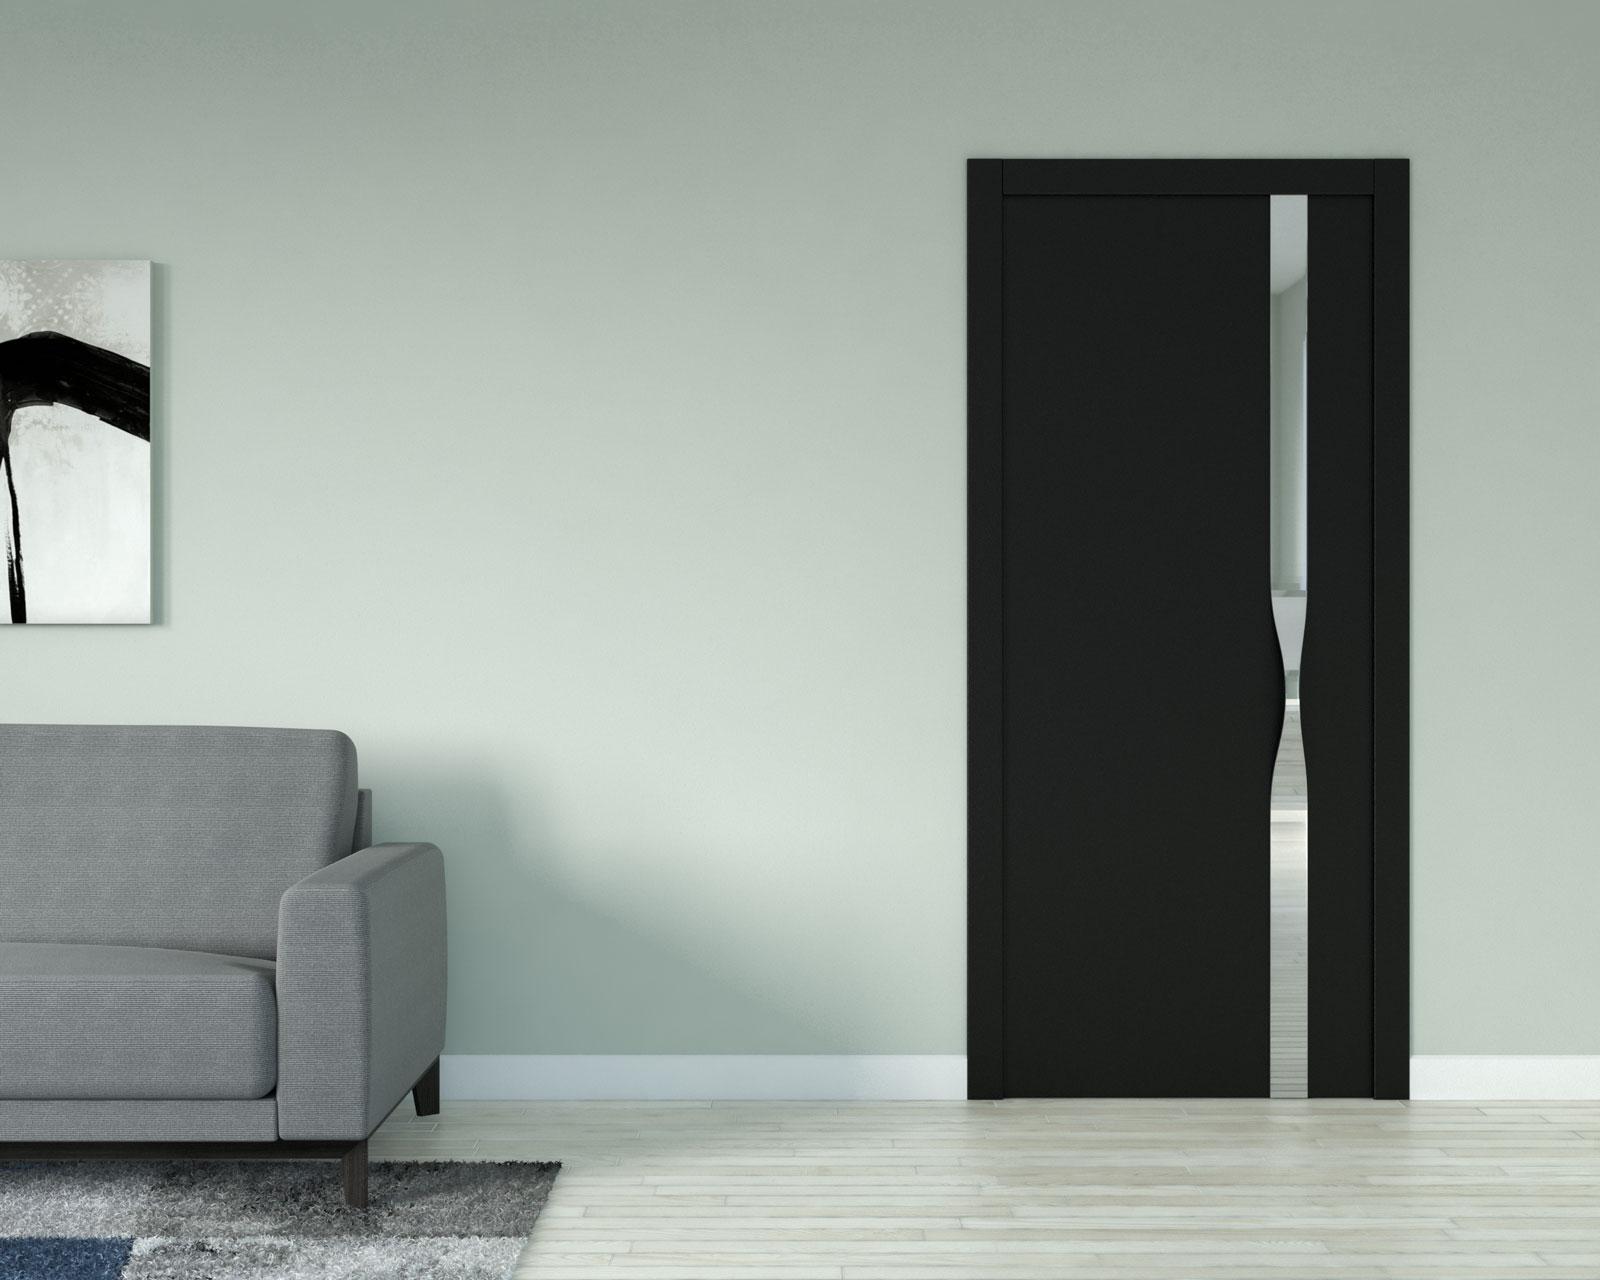 Pale green (sea salt green) wall with black door